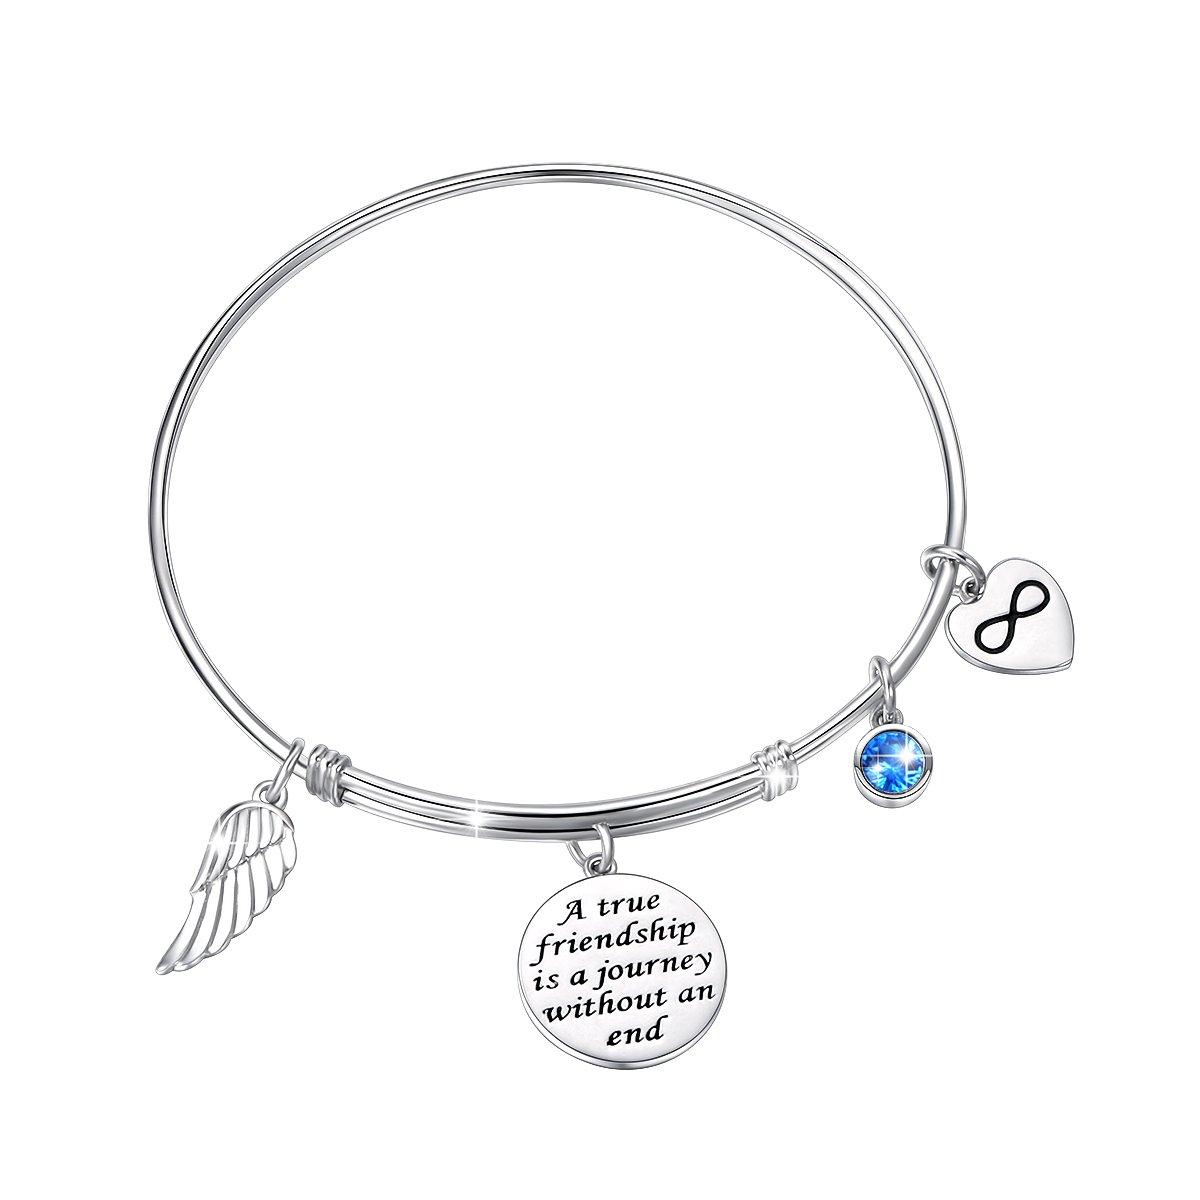 JZMSJF CZ Bracelet 925SterlingSilver Expandable Inspirational Motivational/Friendship Meaningful/Love /Memorial Thankful Beauty/Praise/Religious/Message Charm Bracelets